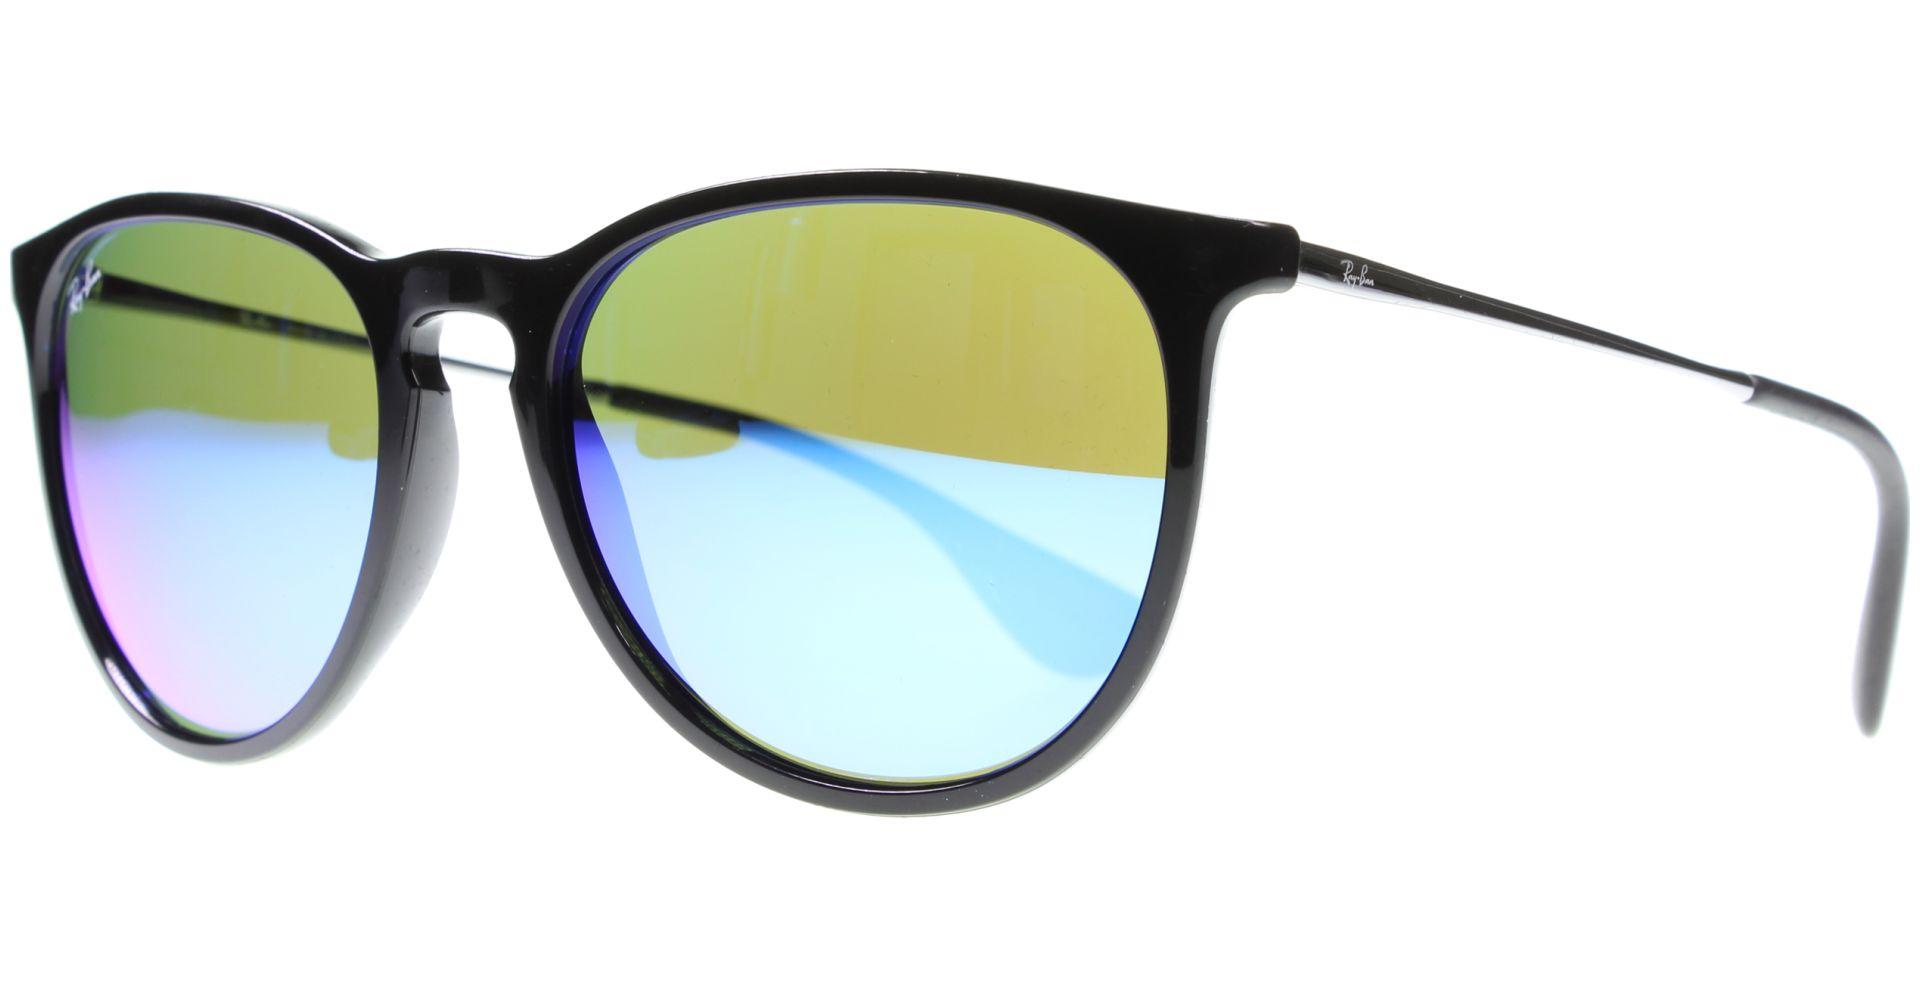 Ray Ban RB4171 601/5A Sonnenbrille Damenbrille Herrenbrille Unisexbrille Wayfarer UXIjUOUKMX